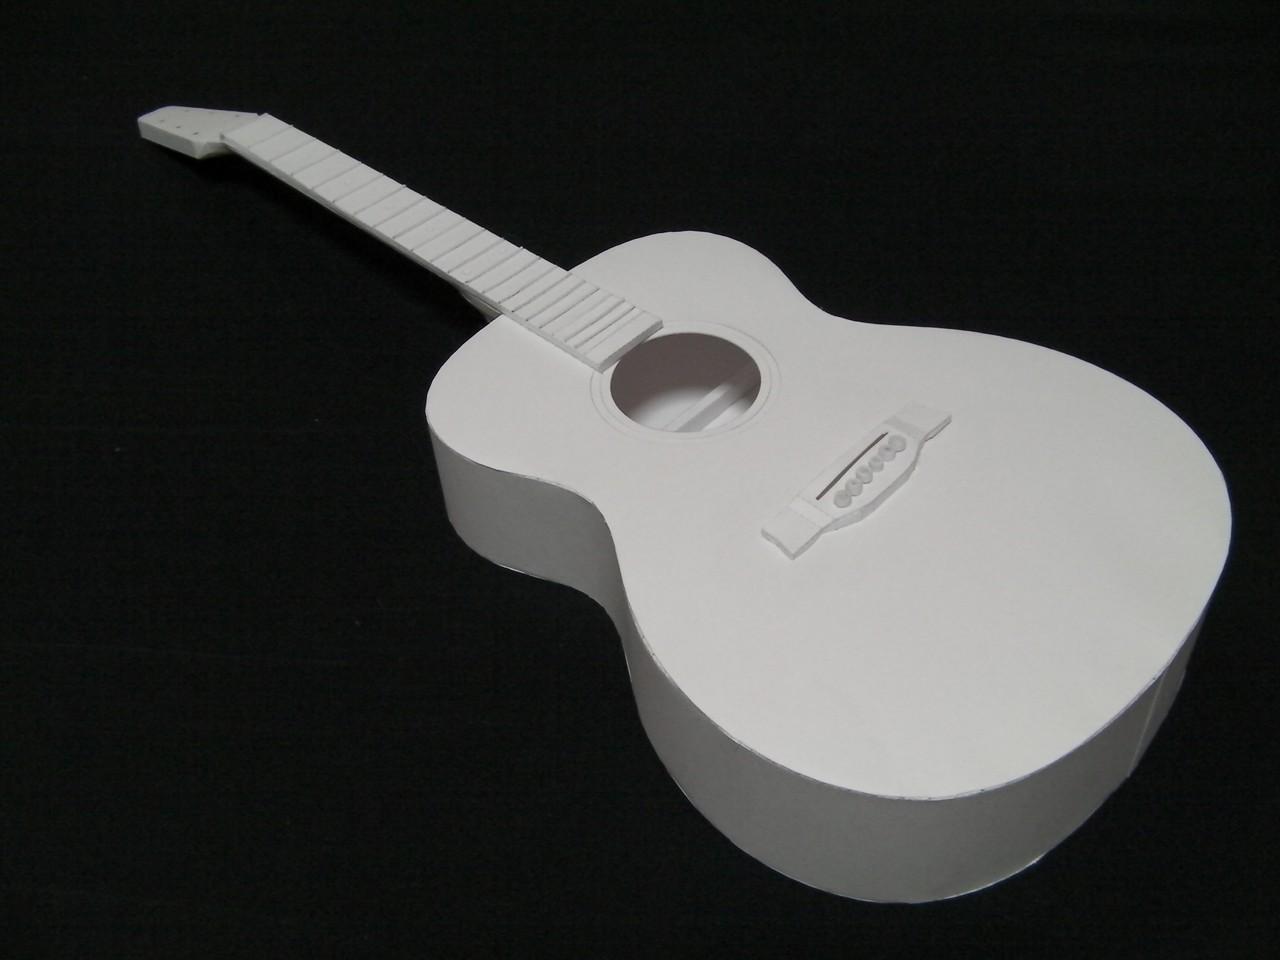 guitar_a015.jpg